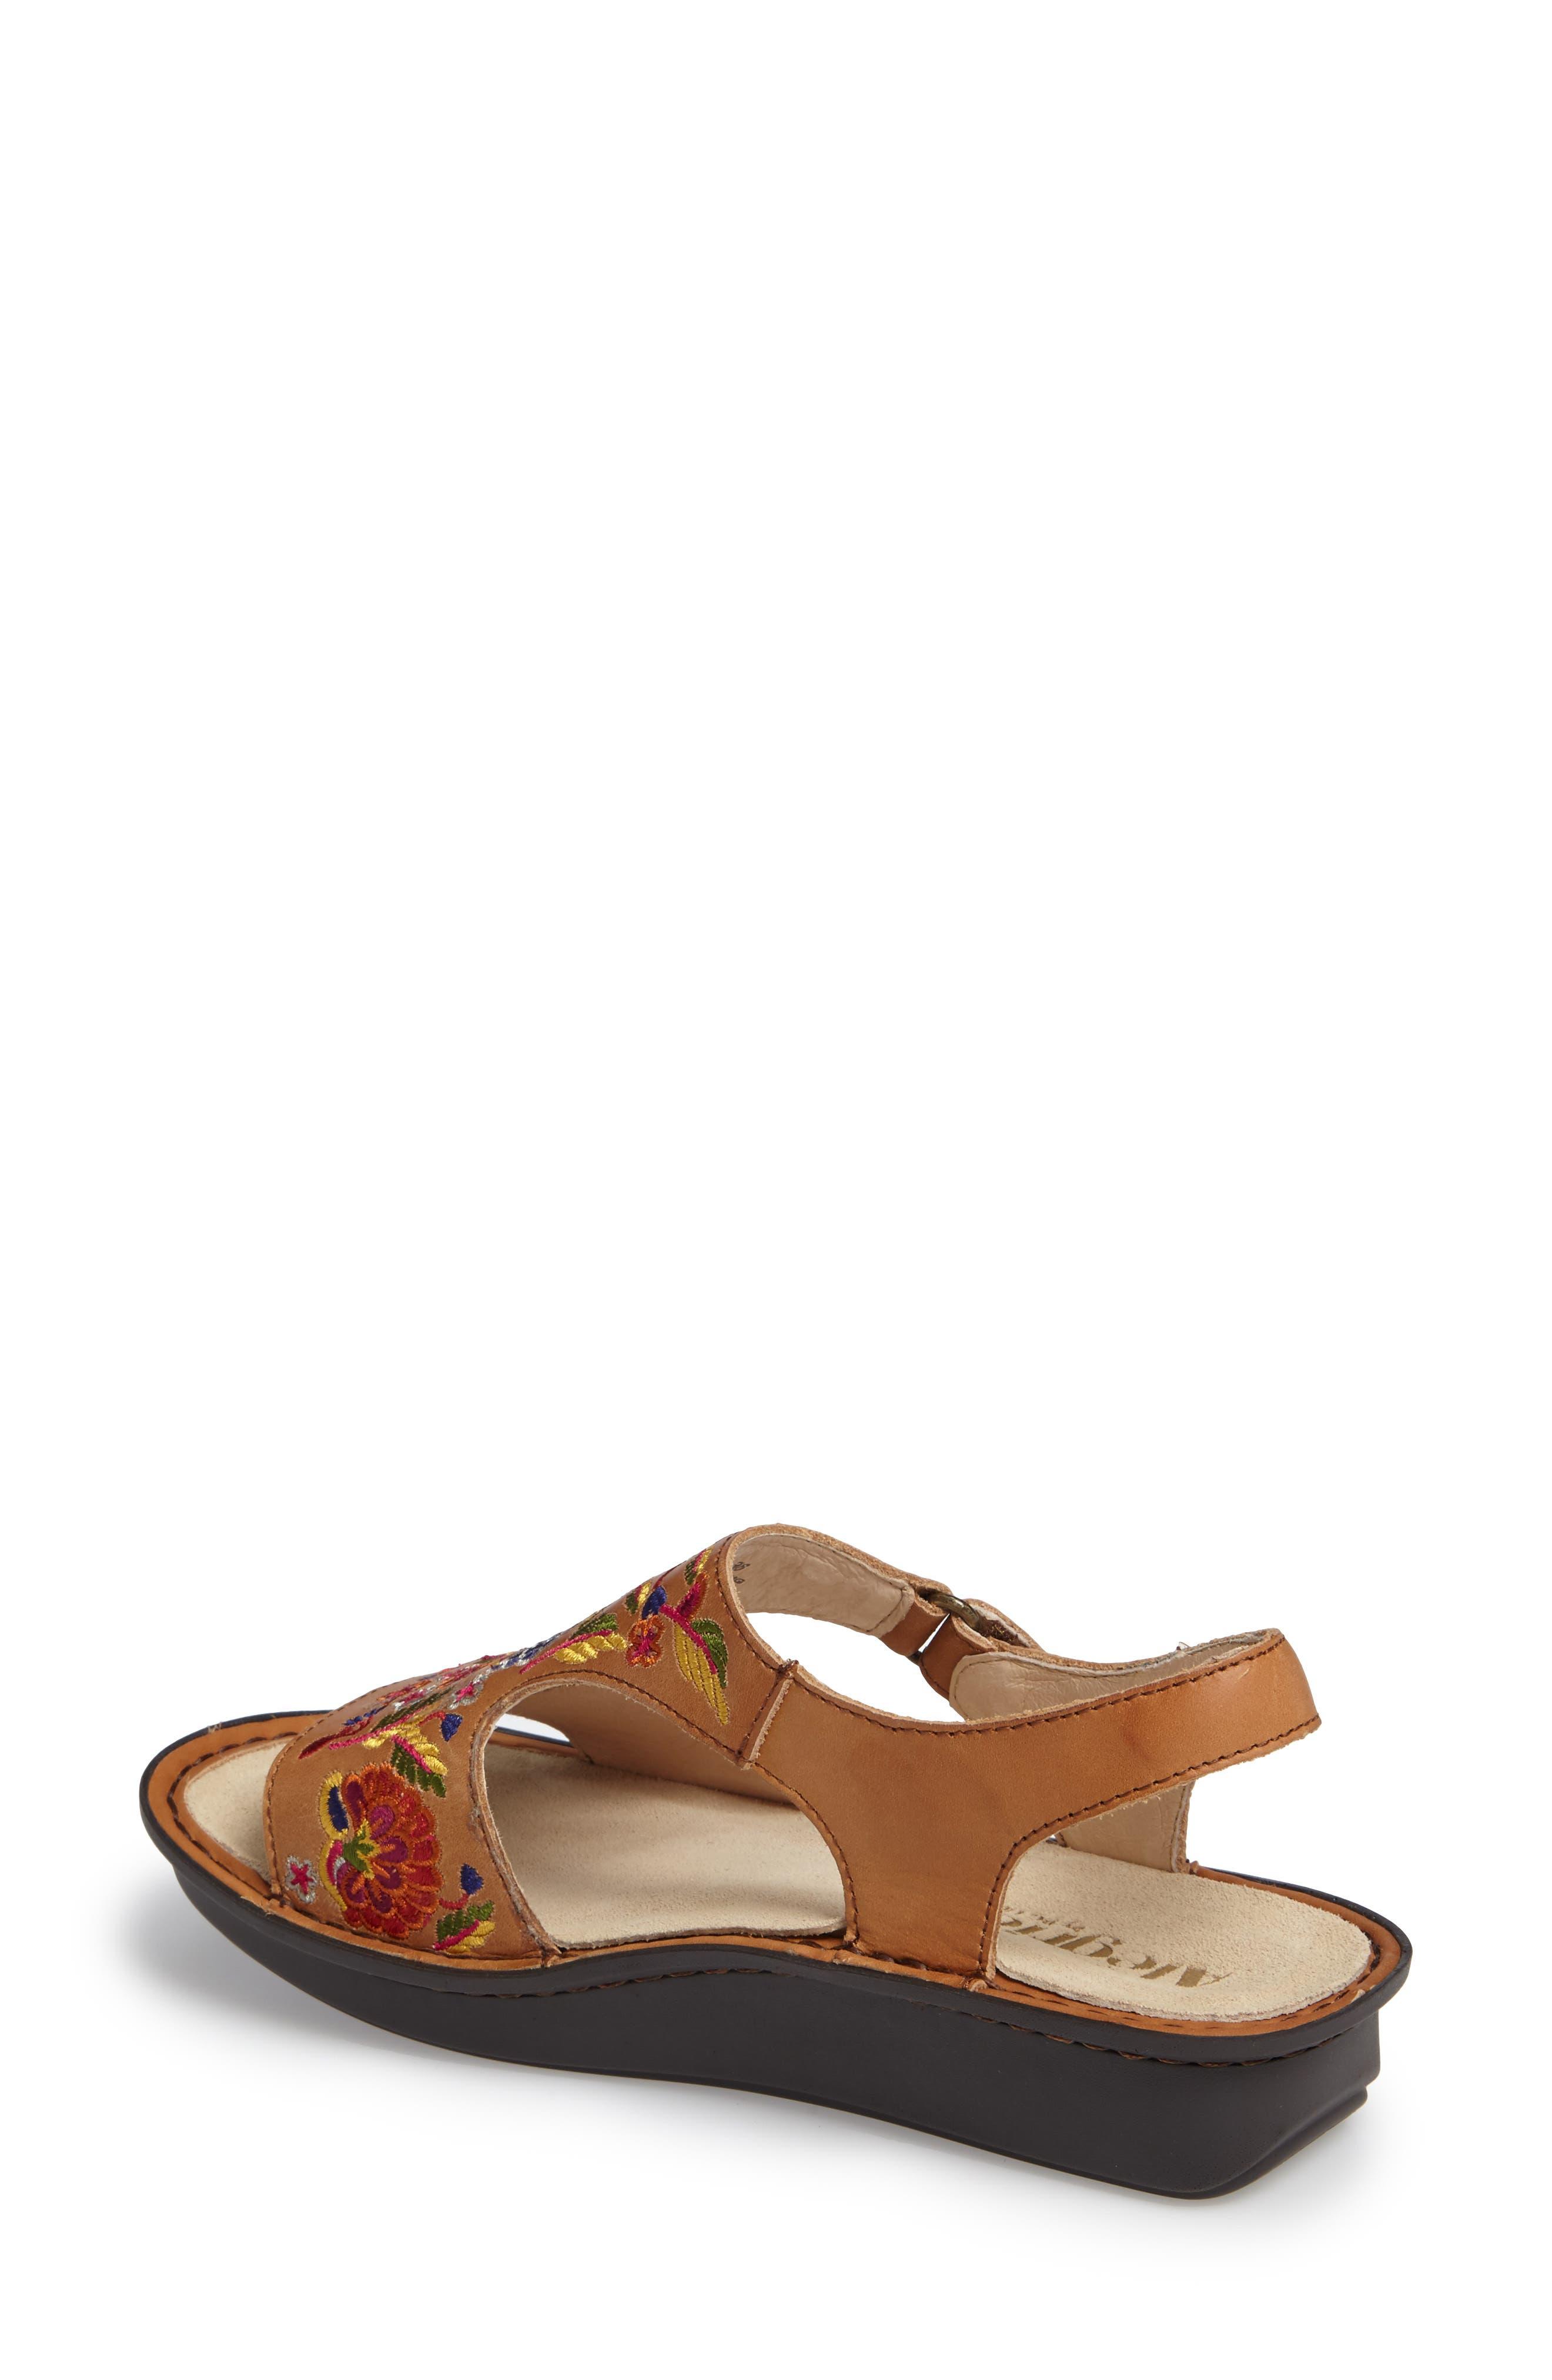 Viki Embroidered Sandal,                             Alternate thumbnail 2, color,                             Cognac Pins/ Needles Leather